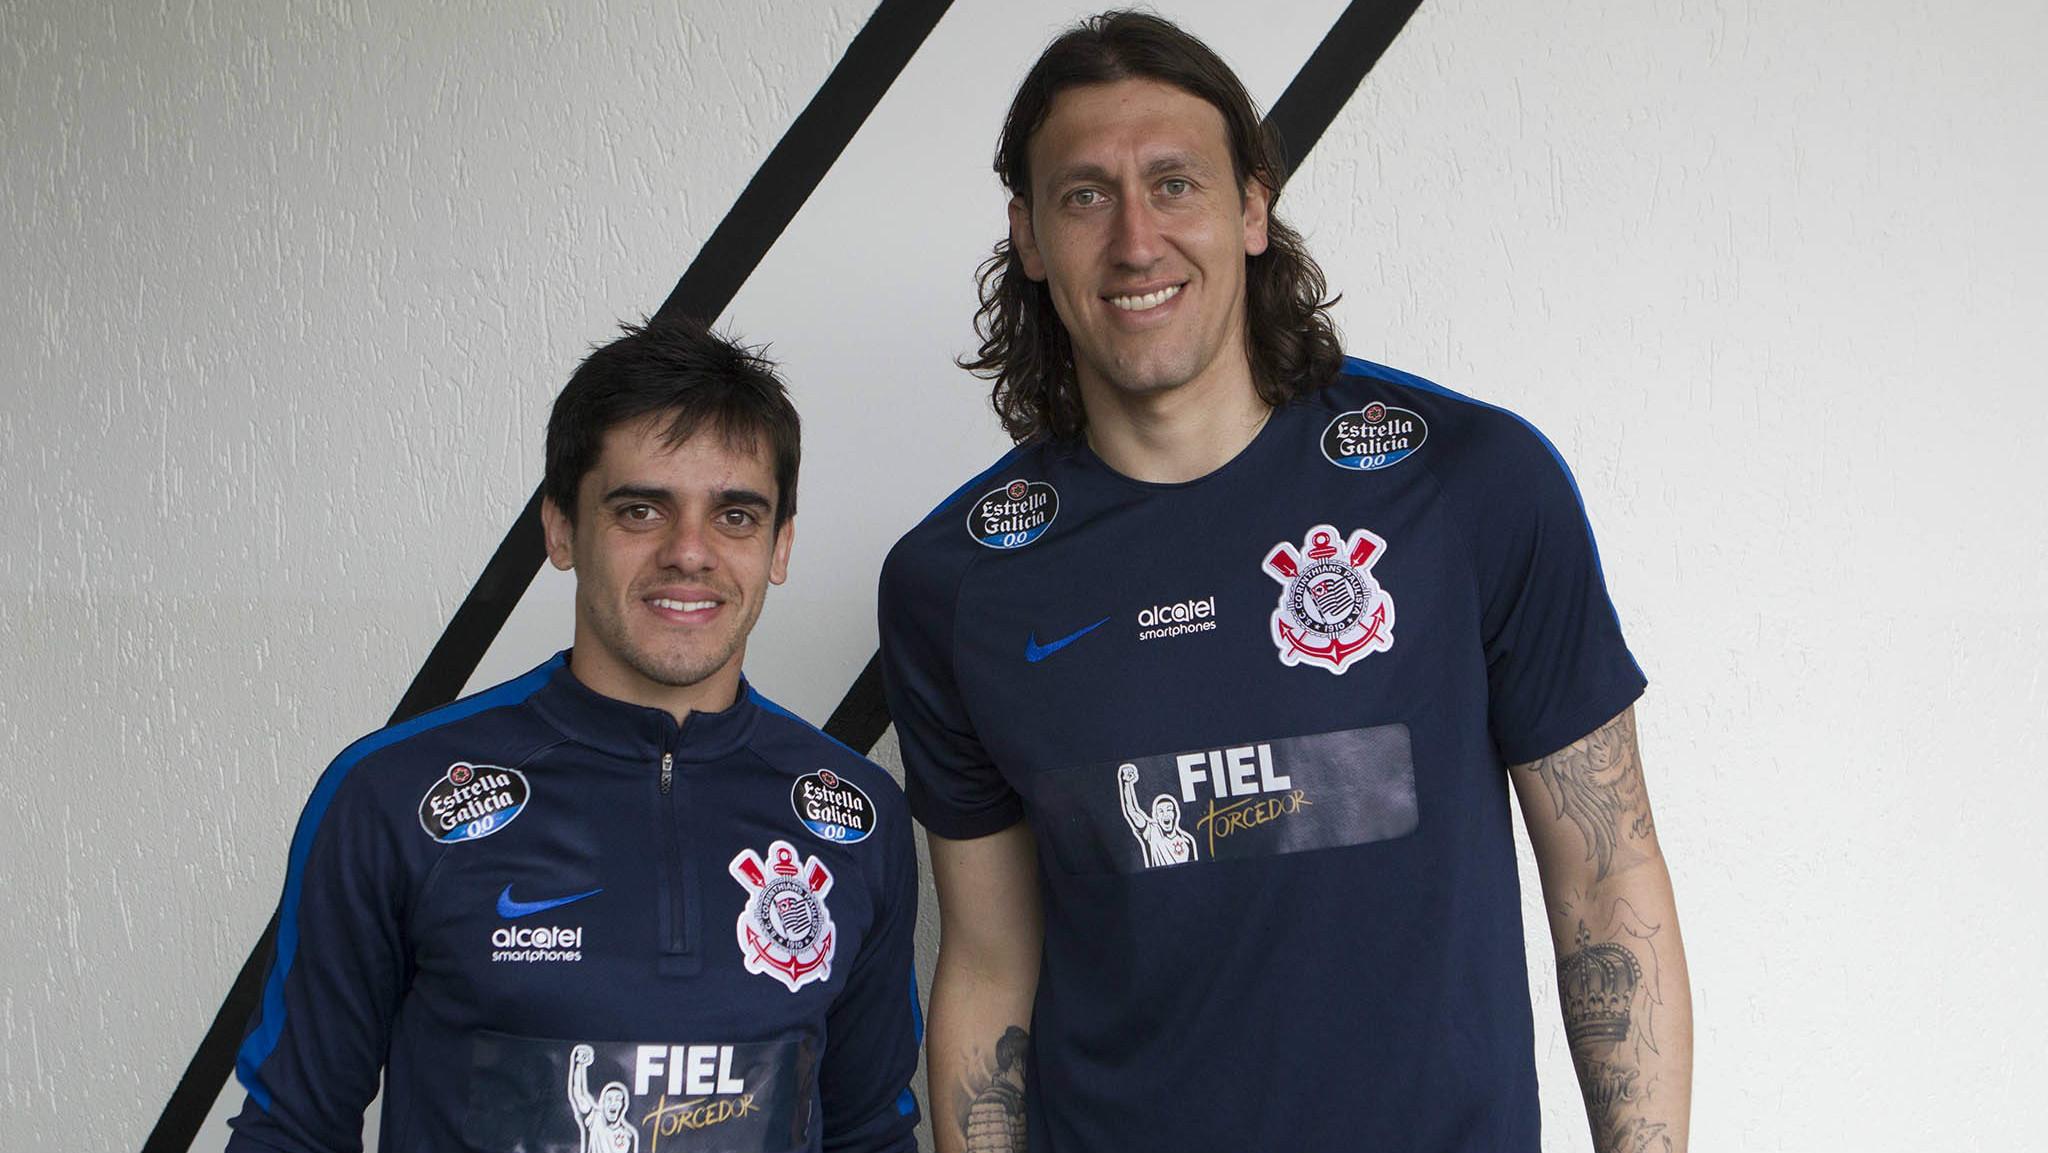 Cássio e Fagner - Corinthians - 10/08/2017